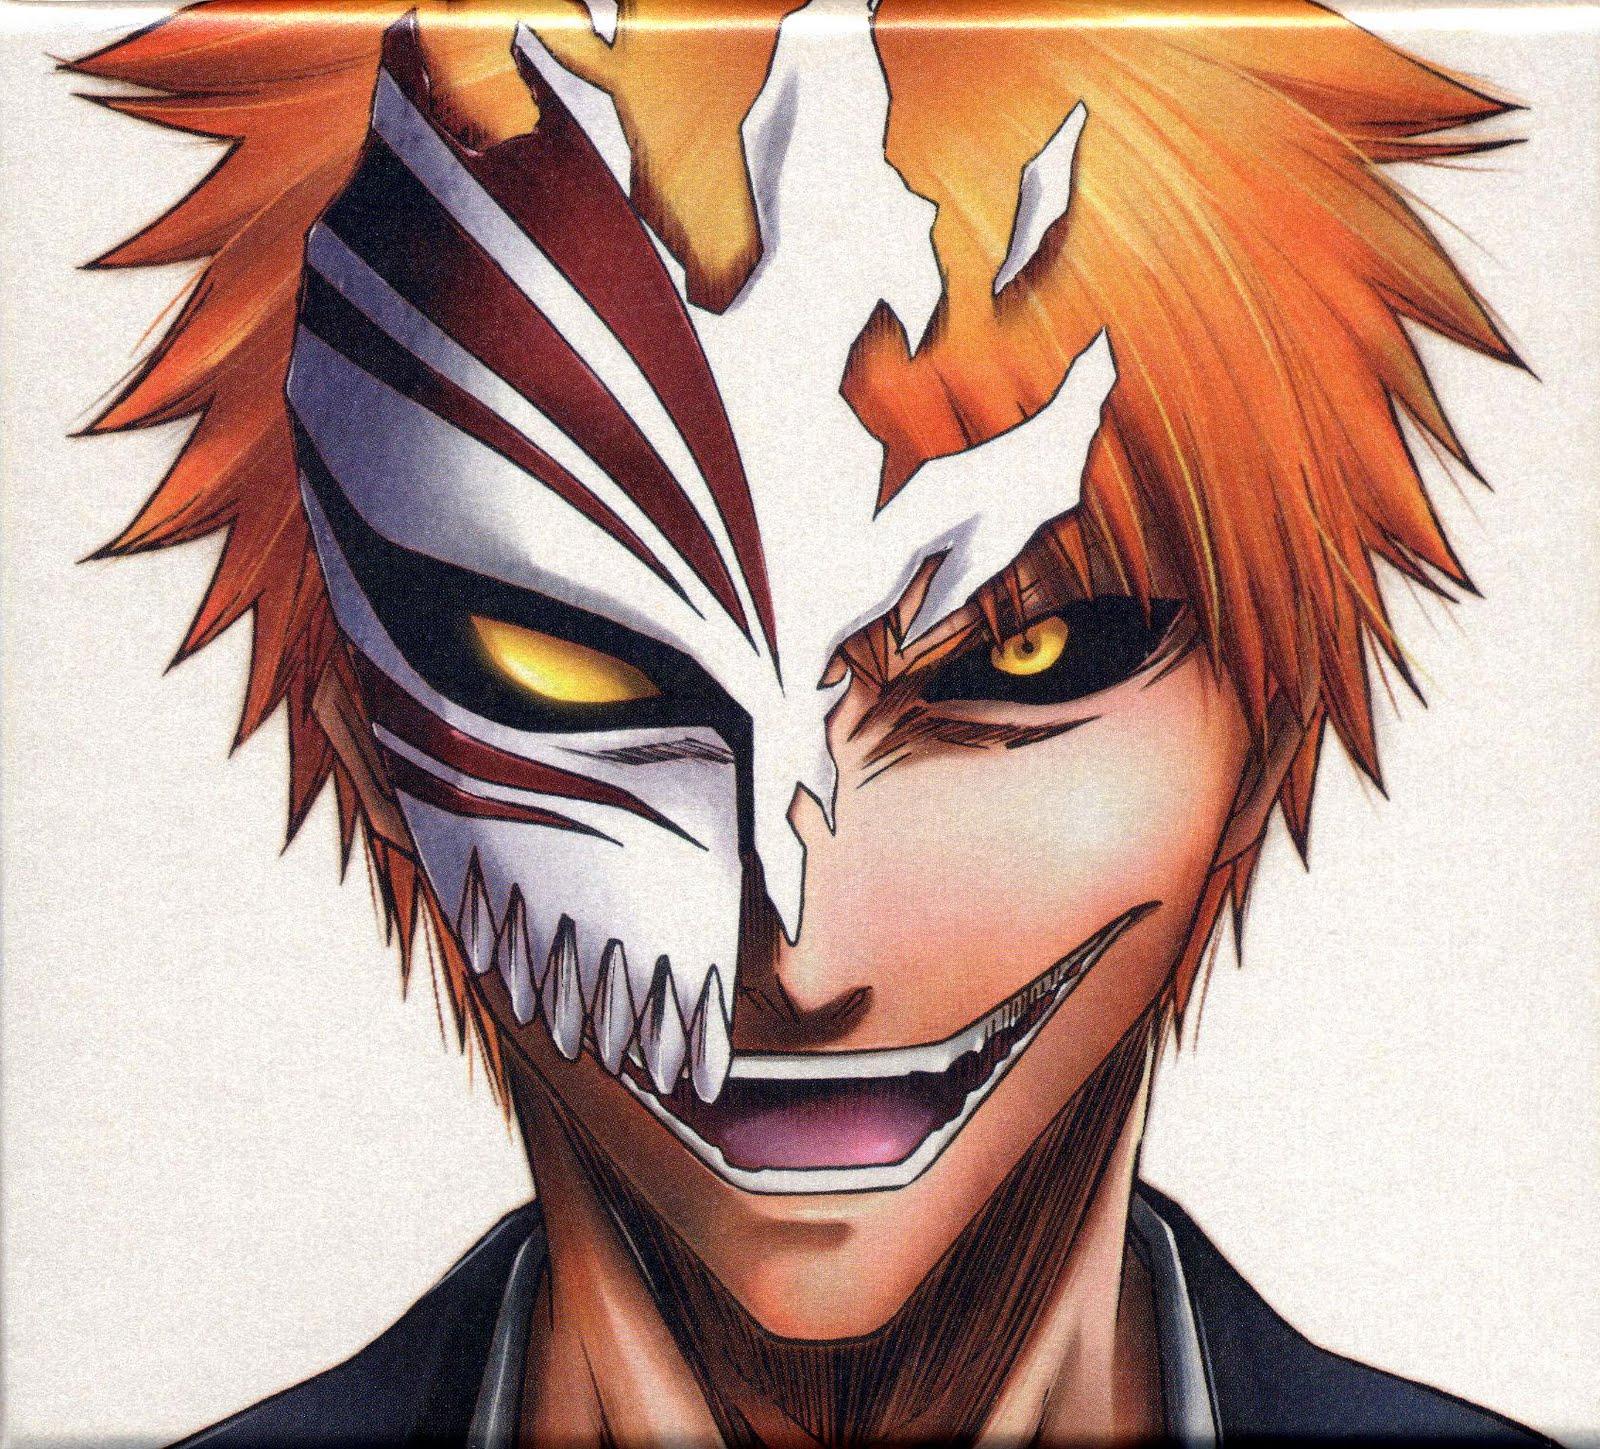 Gurly Things: Hollow Mask From Bleach (Ichigo) Makeup